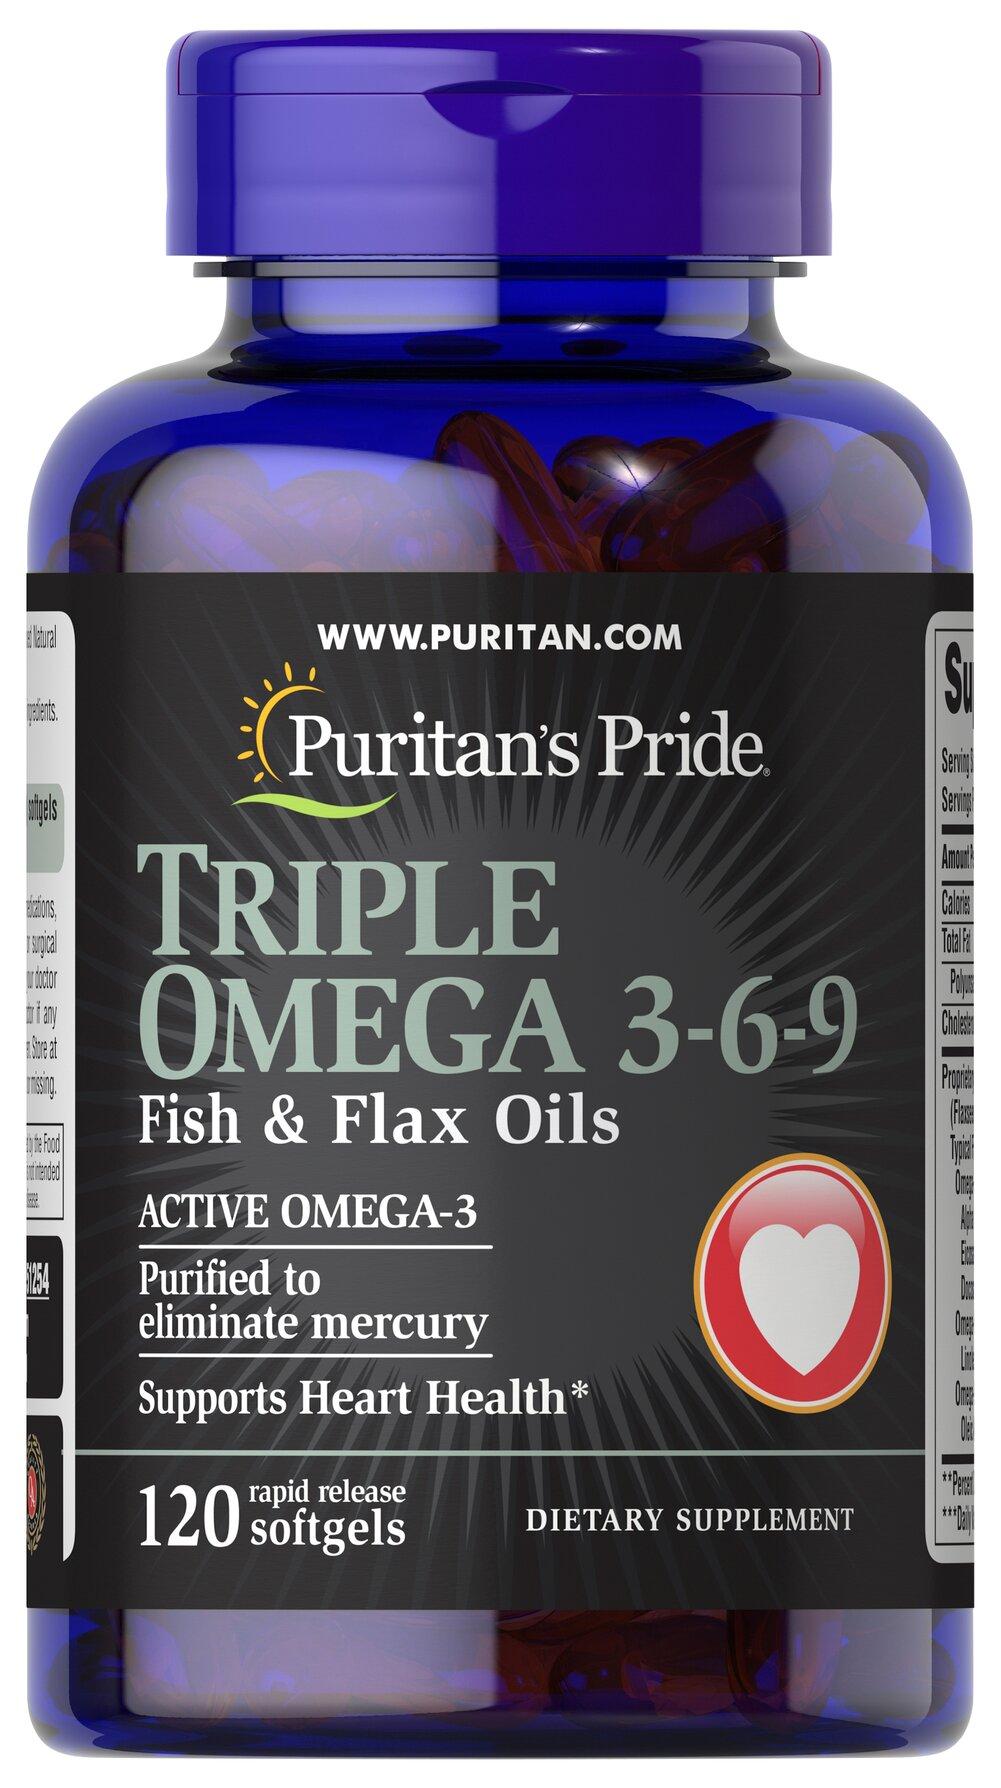 Triple omega 3 6 9 fish flax oils 120 softgels fish for Fish oil 3 6 9